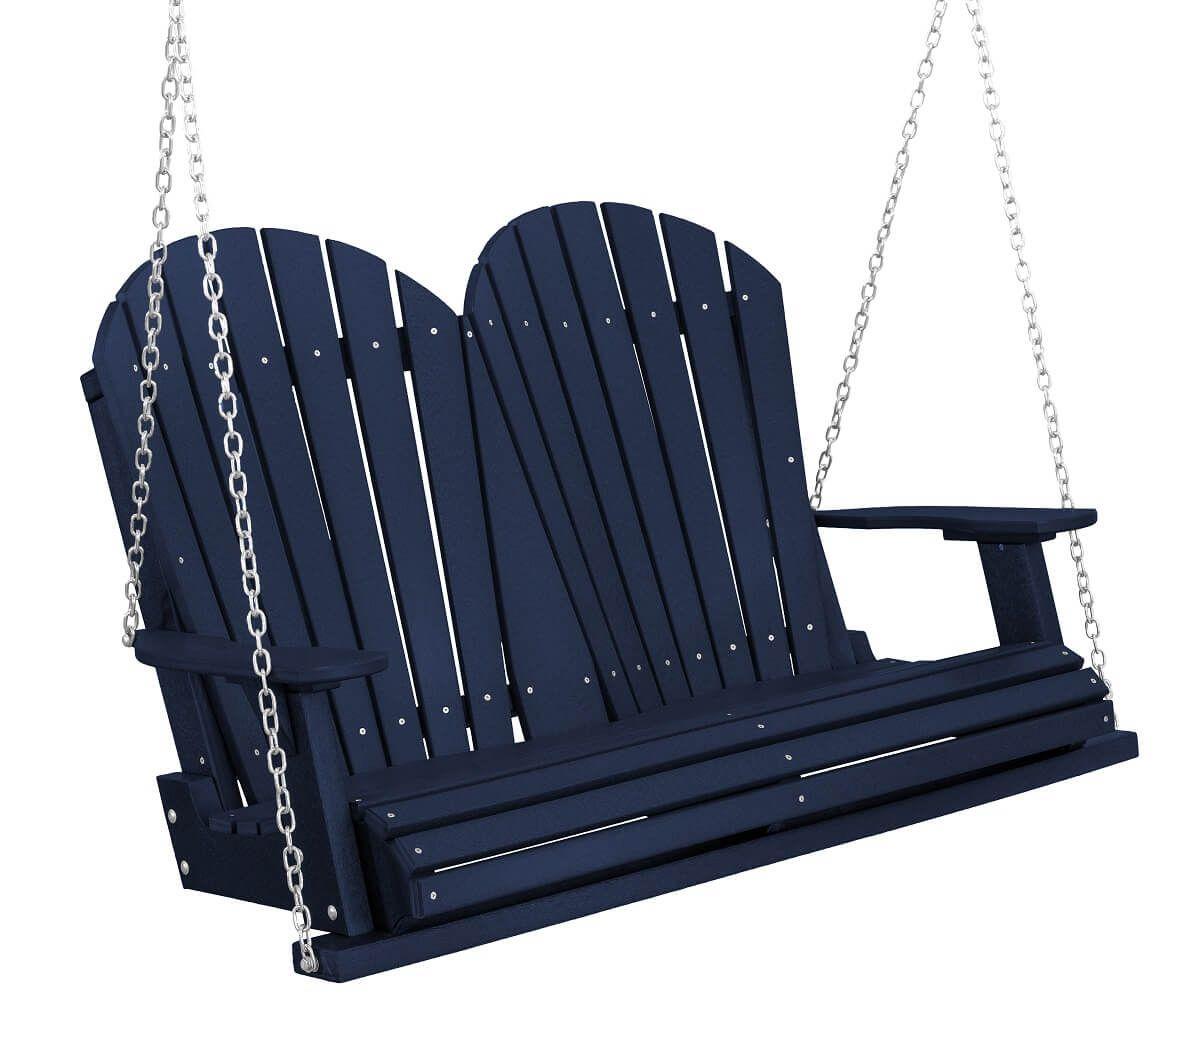 Patriot Blue Sidra Outdoor Porch Swing